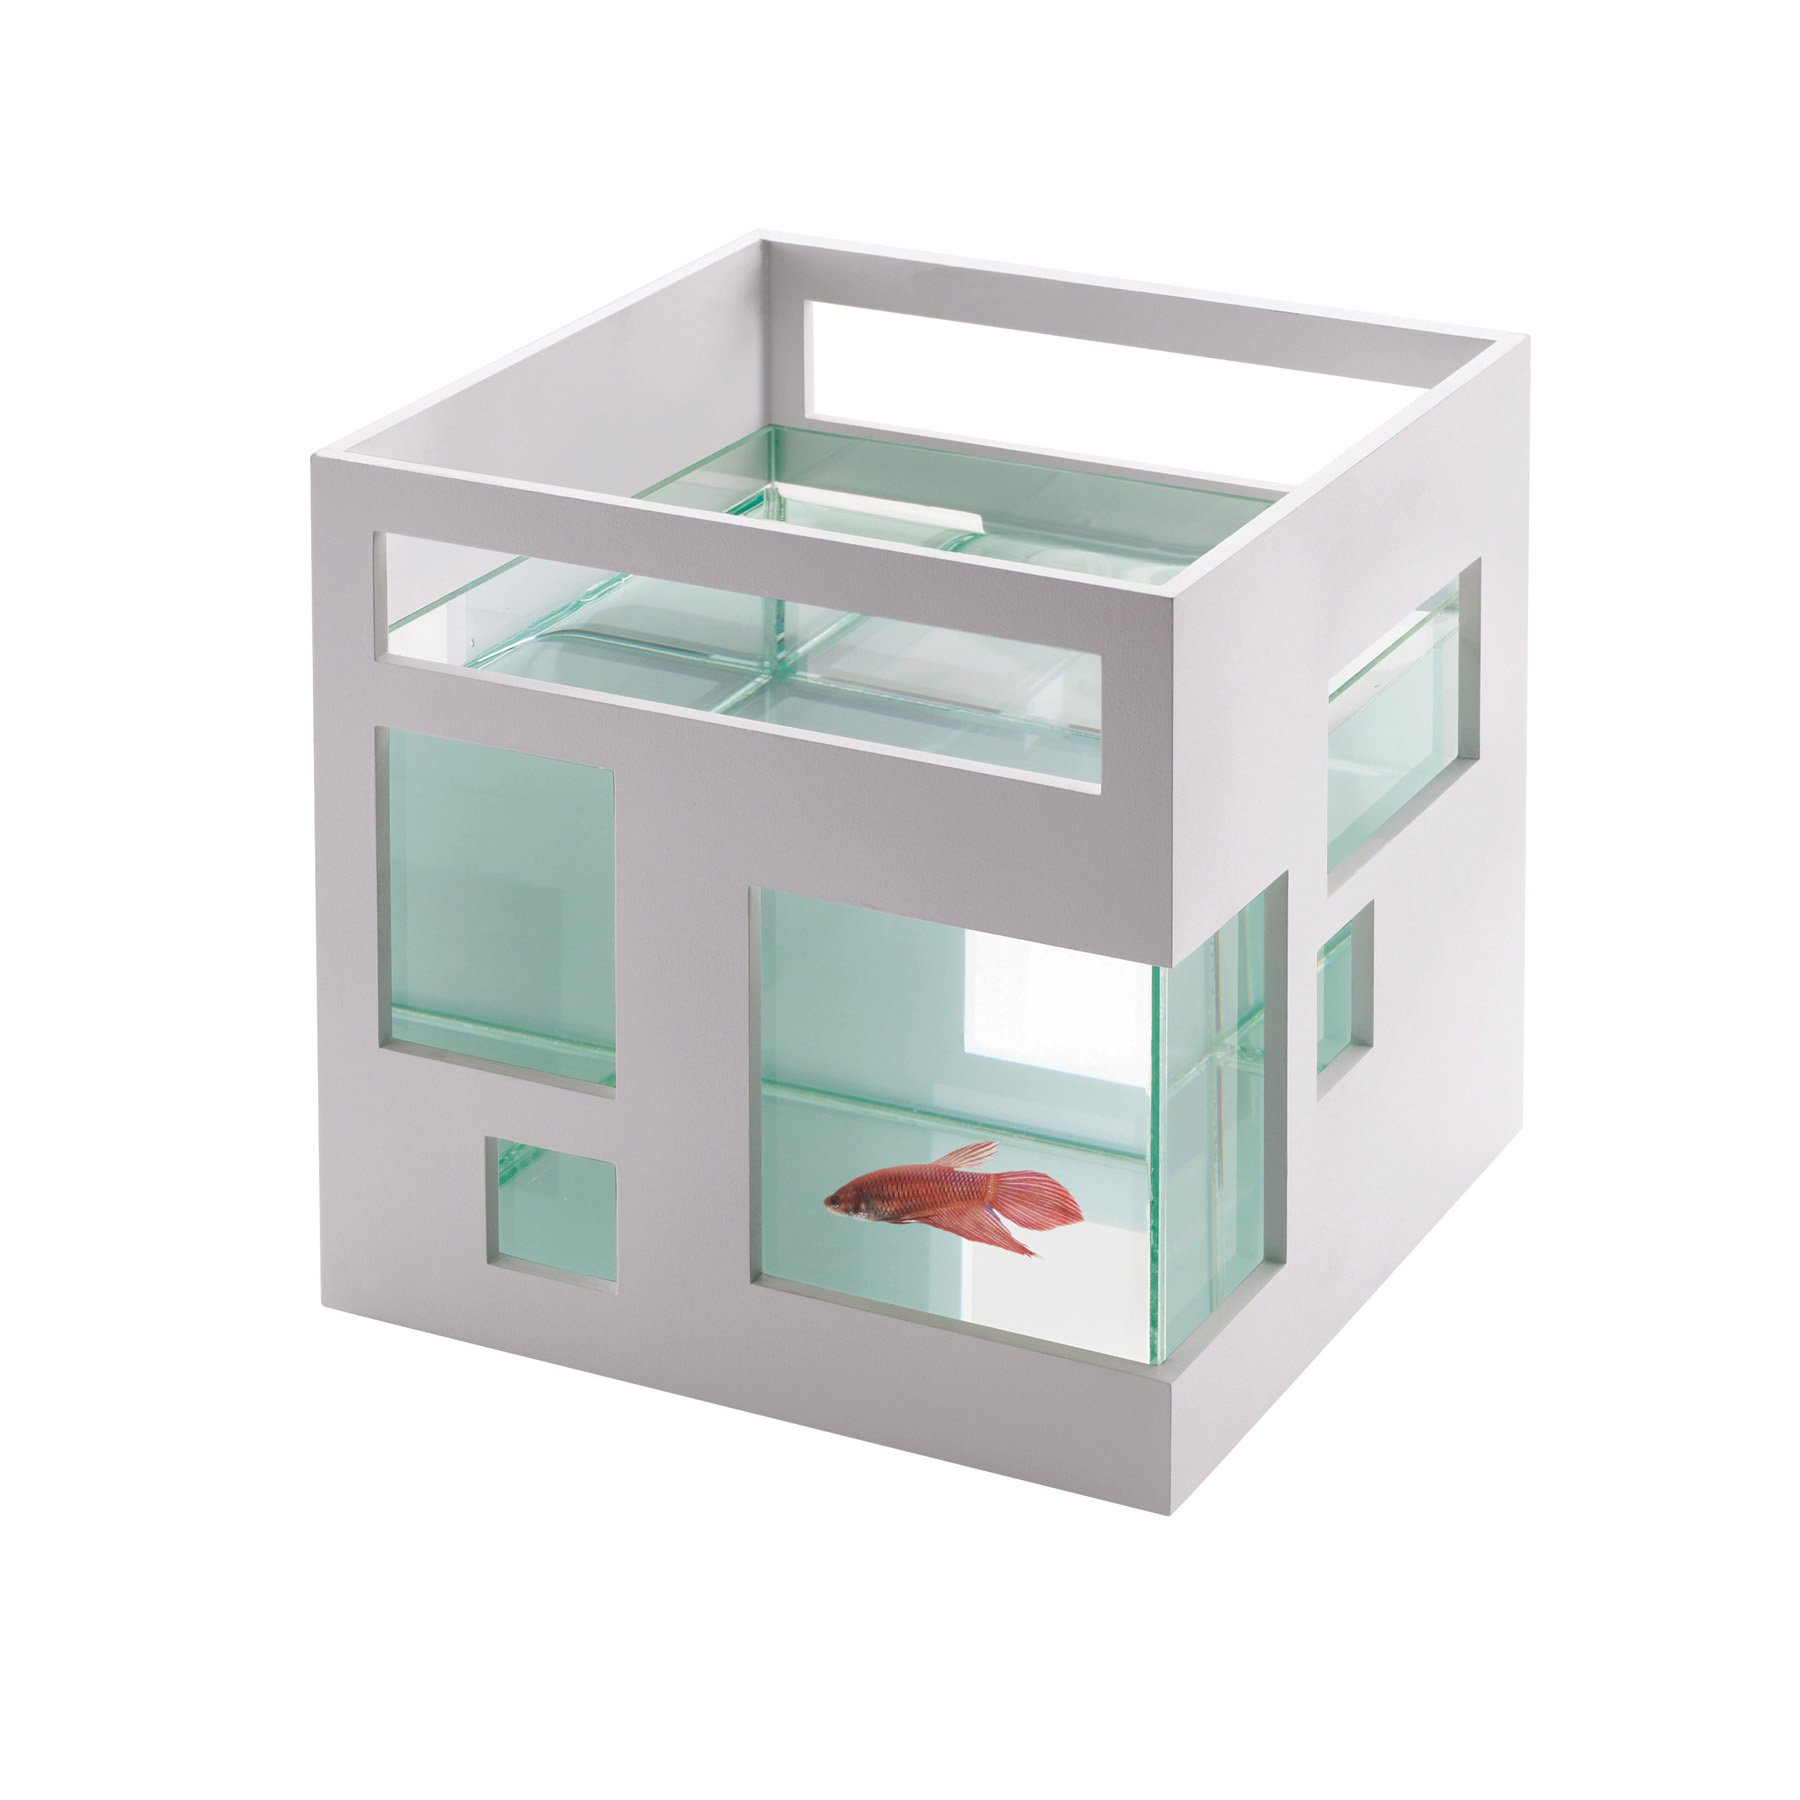 Umbra FishHotel Mini Aquarium, Great for Goldfish, Bettas, and Other Small Fish, 1.8 Gallon